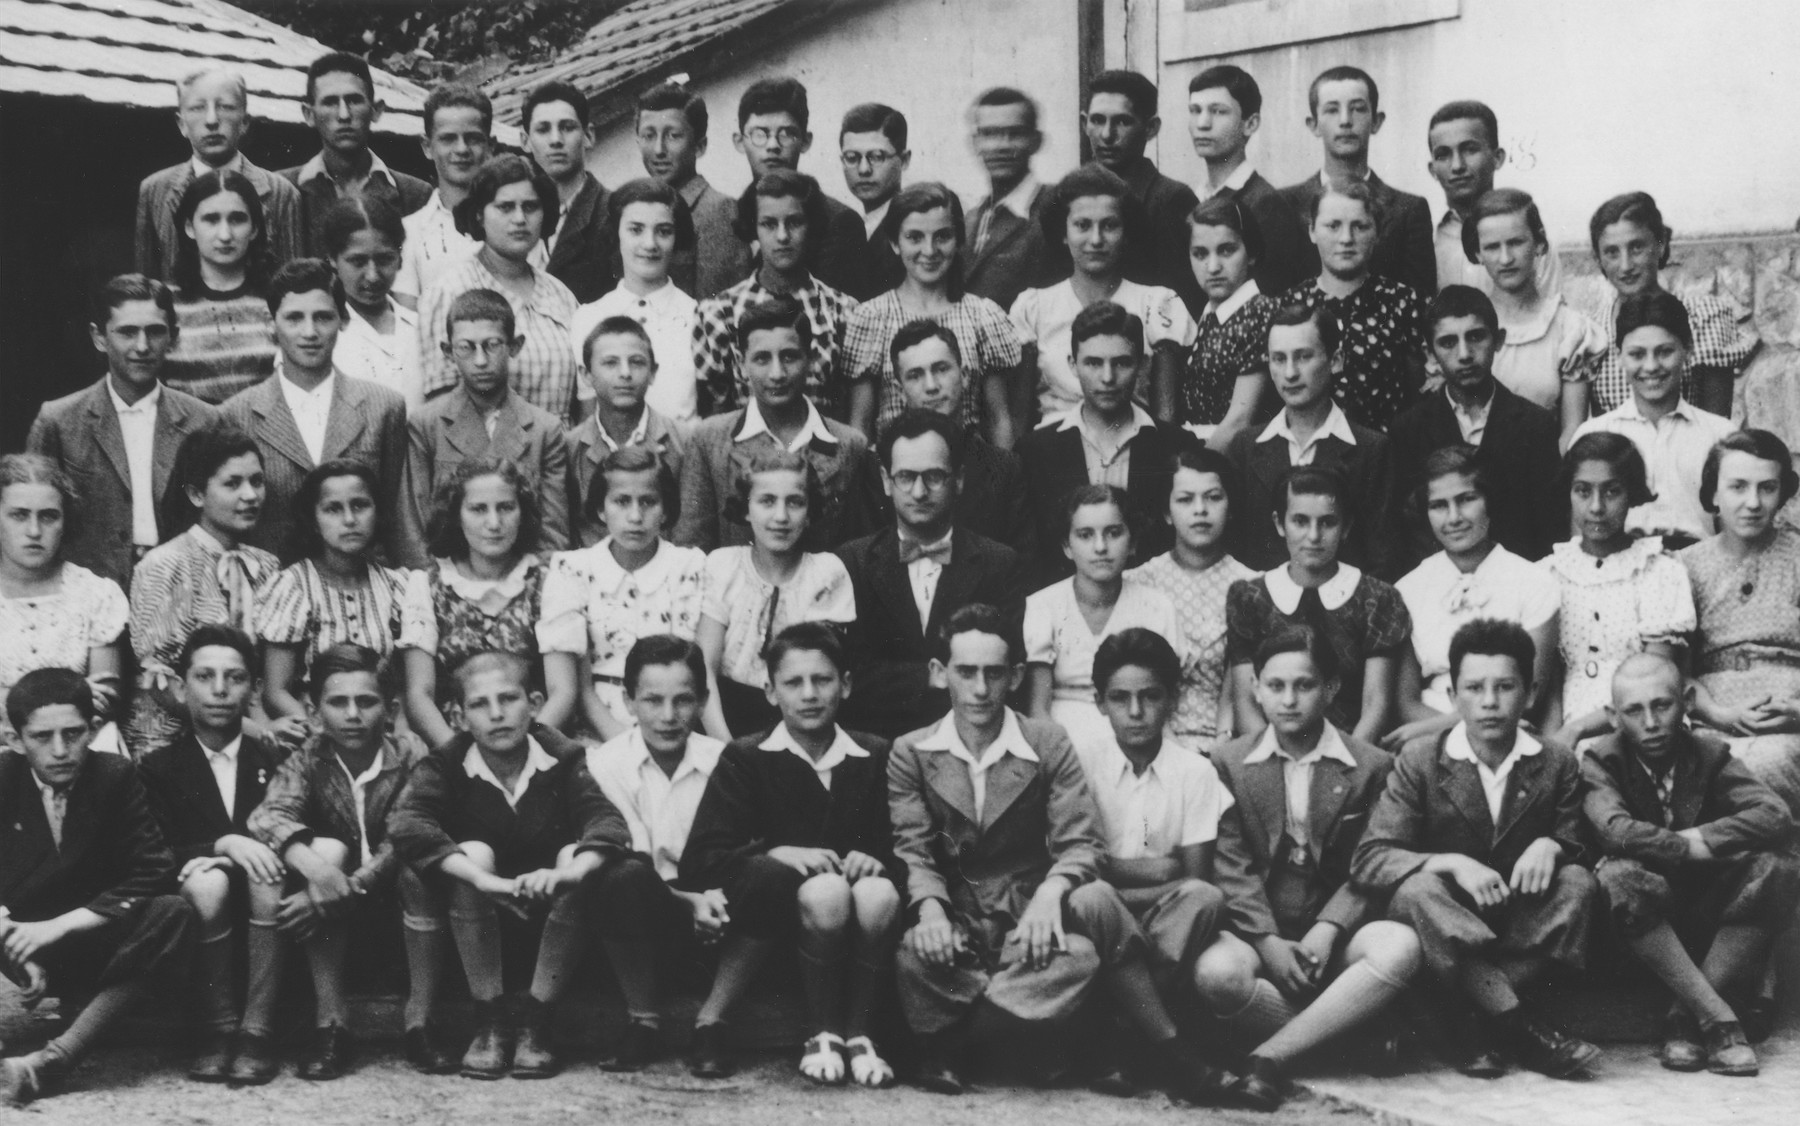 Group portrait of students and teachers at the Hebrew gymnasium in Mukachevo.  Those pictured include: First row (left to right) Jeno Goldberger, Kopolovich, unknown, Mermelstein, Kopolovich, Friedman, Josef Mordechai (Mattju) Gottesman, Taci Joszipovics,   [possibly] Tibor Gottesman, Greenberger, and Abraham.  Second row: Sari Haupt, Babuci Birnbaum, Vera Berkovich, Sidi Grunstein, Lola Sternbach, Mimi Enneman, Jeno Morvai (teacher), Goldi Gluck, Patyu (Shoshanan) Friedman, Richie Seidenfeld, Friedman, unknown, unknown.  Third row: Laci Weinberger, Hersi Birnbaum, Klein, Mermelstein, Birnbaum, Hermanovich, Judu Muhlrad, Ringler, unknown, Tobias.  Fourth row: Oti Rubin, Agi Block, Gottesman, Ibu Schonberg, Alice Kornreich, Mermelstein, Ruki Jakober, Hoenig, Eva Schonfeld, Nancsi Berkovics and Friedman.  Top row: Unknown, Neuman, Berkovitz, Bela Zelemovich, Andrew Stern, unknown, Gross, Rudolf Farbenblum, Safar, Feri Fullman, Klein, and Zvi Steiger.